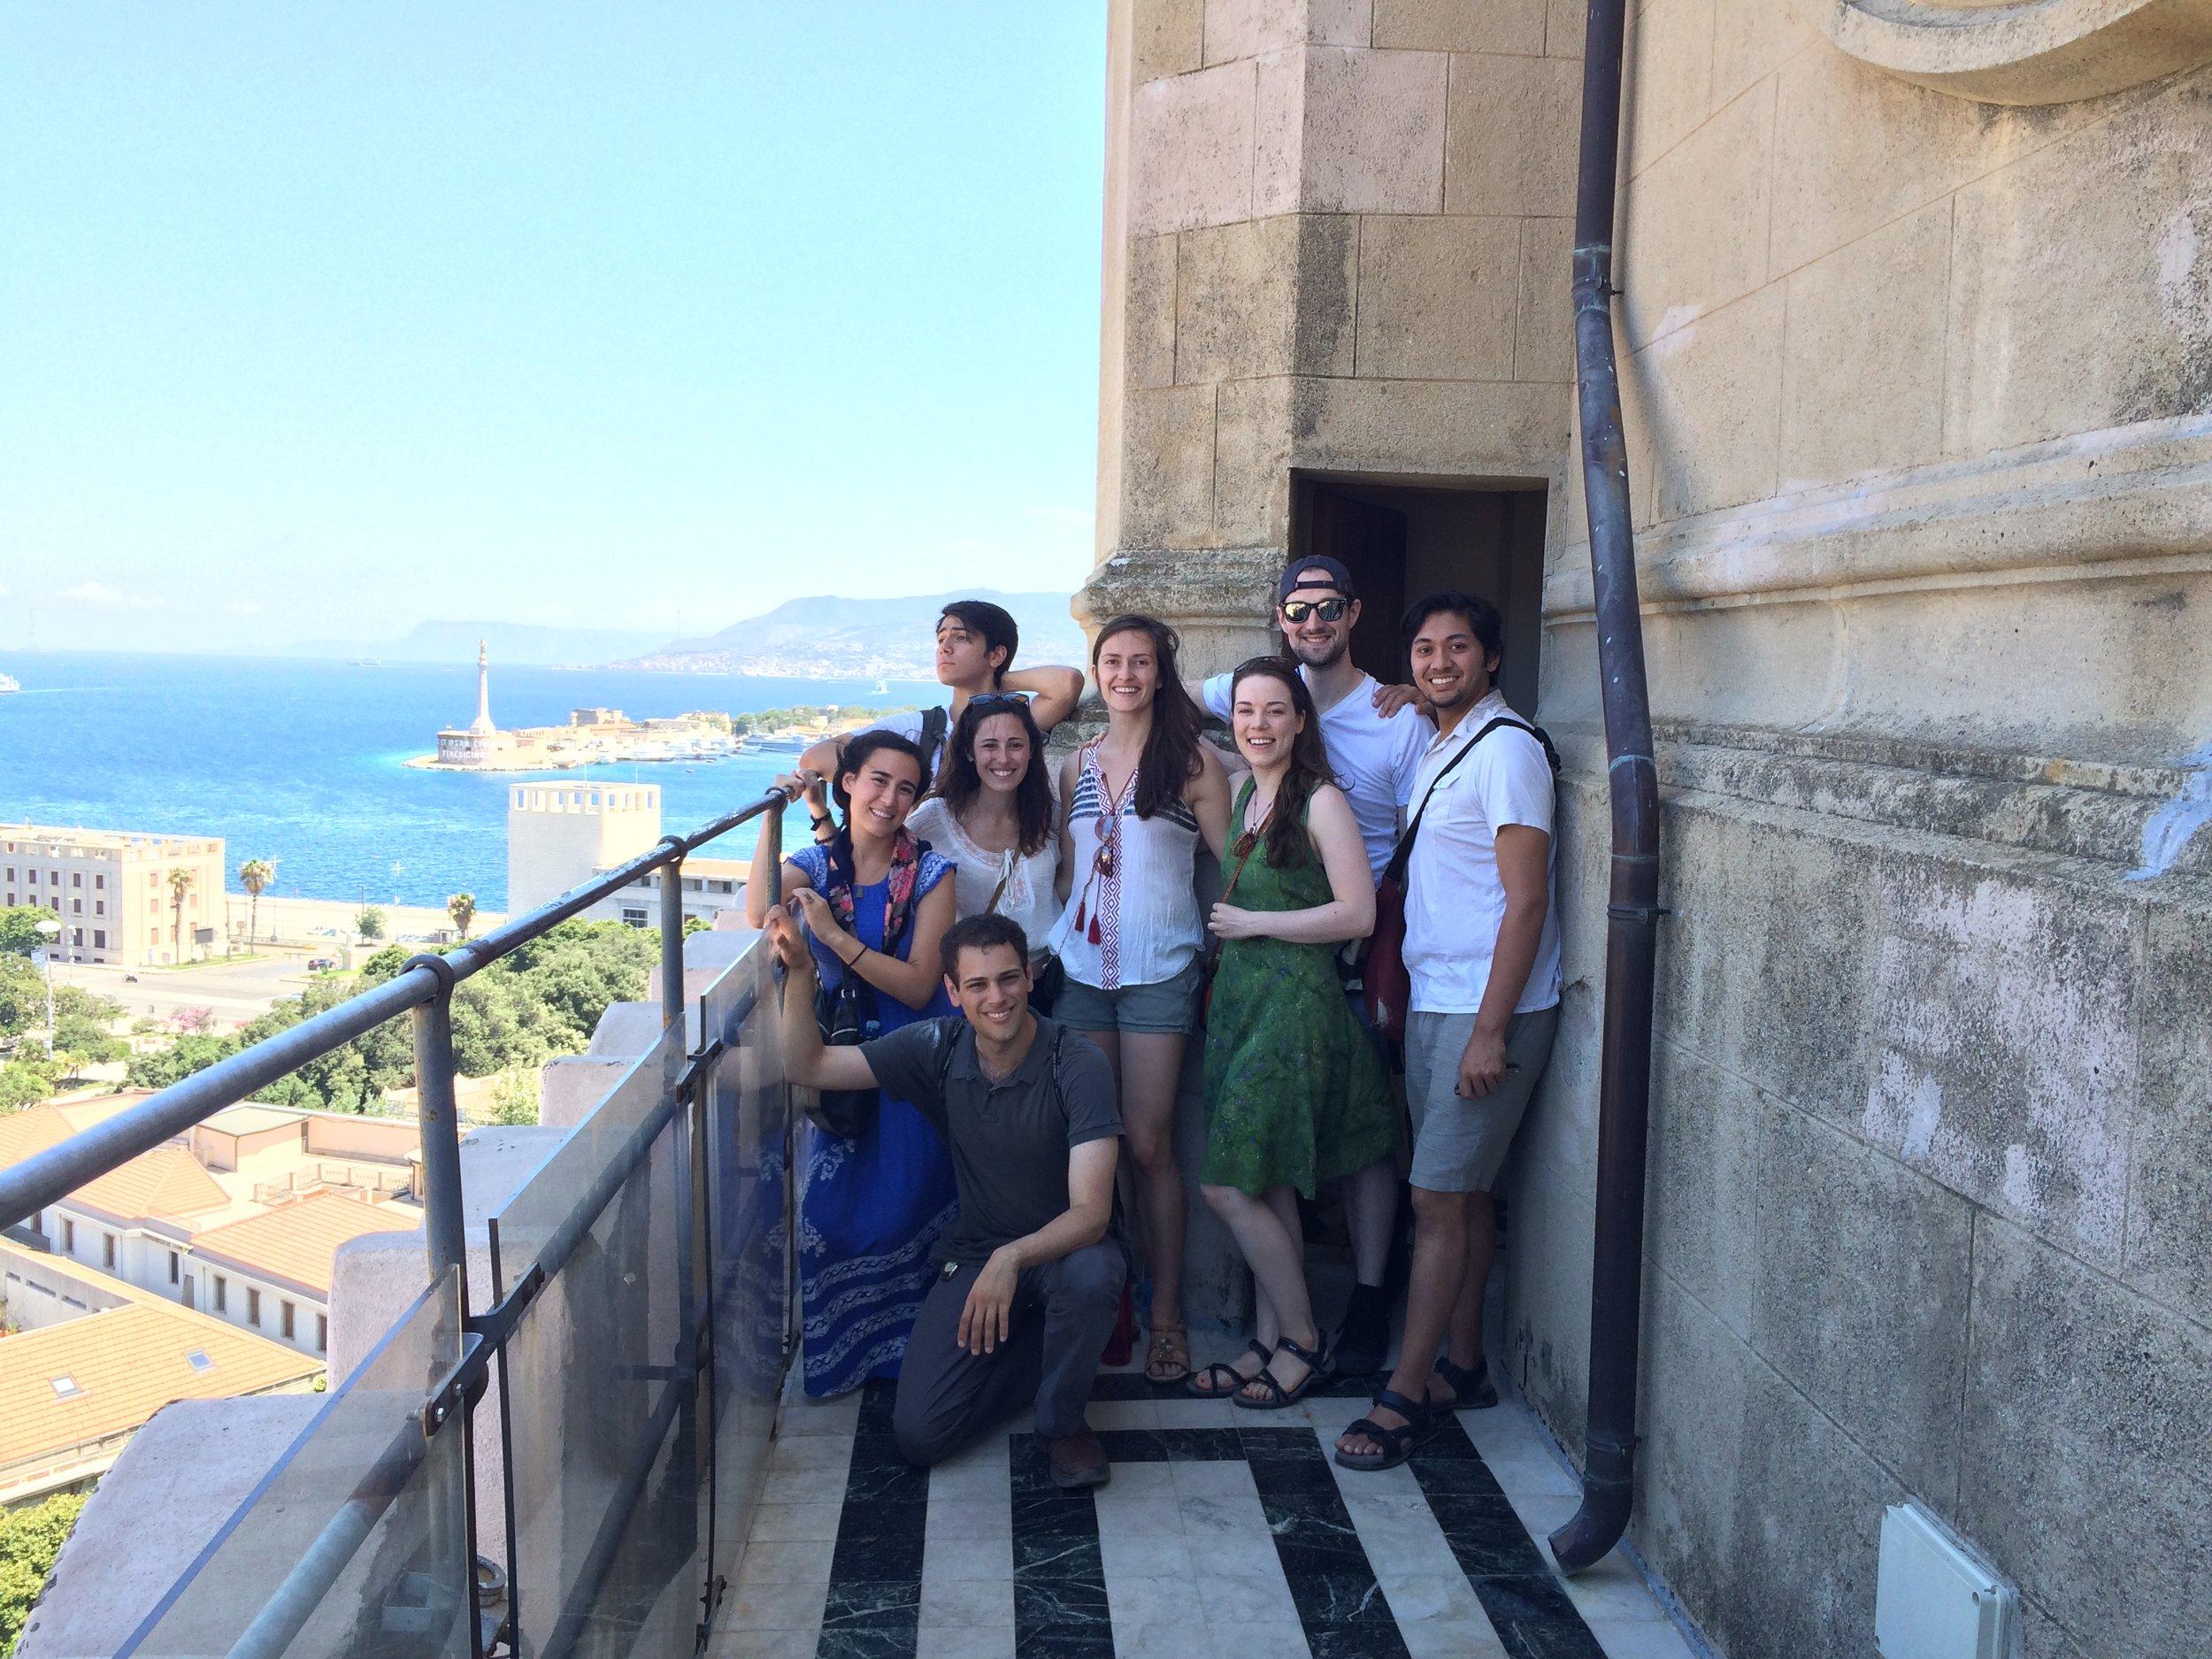 The Clocktower, Messina